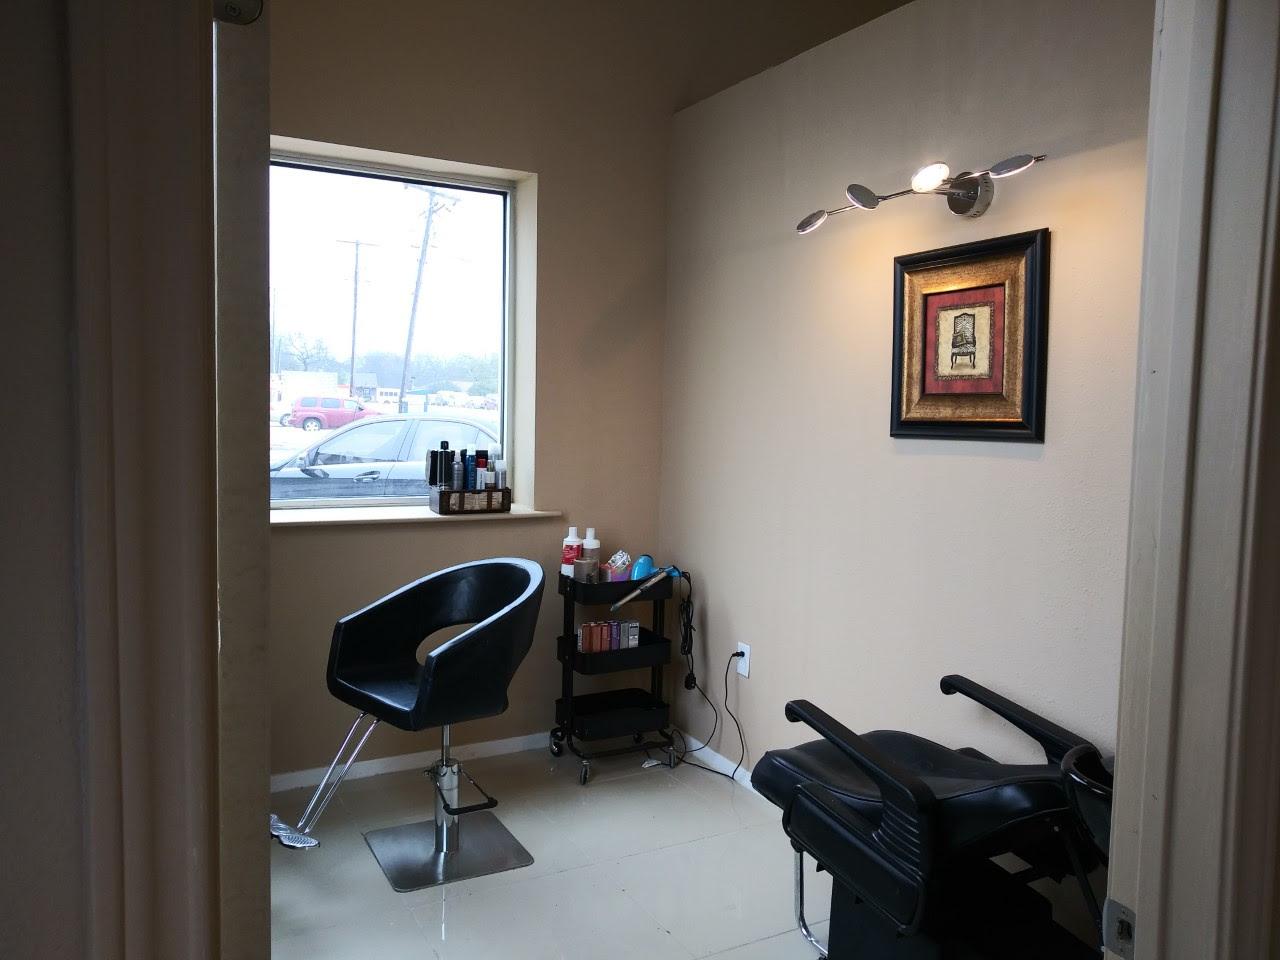 Beauty Salon Highway 78 and FM544, Salon Suite for Rent ...